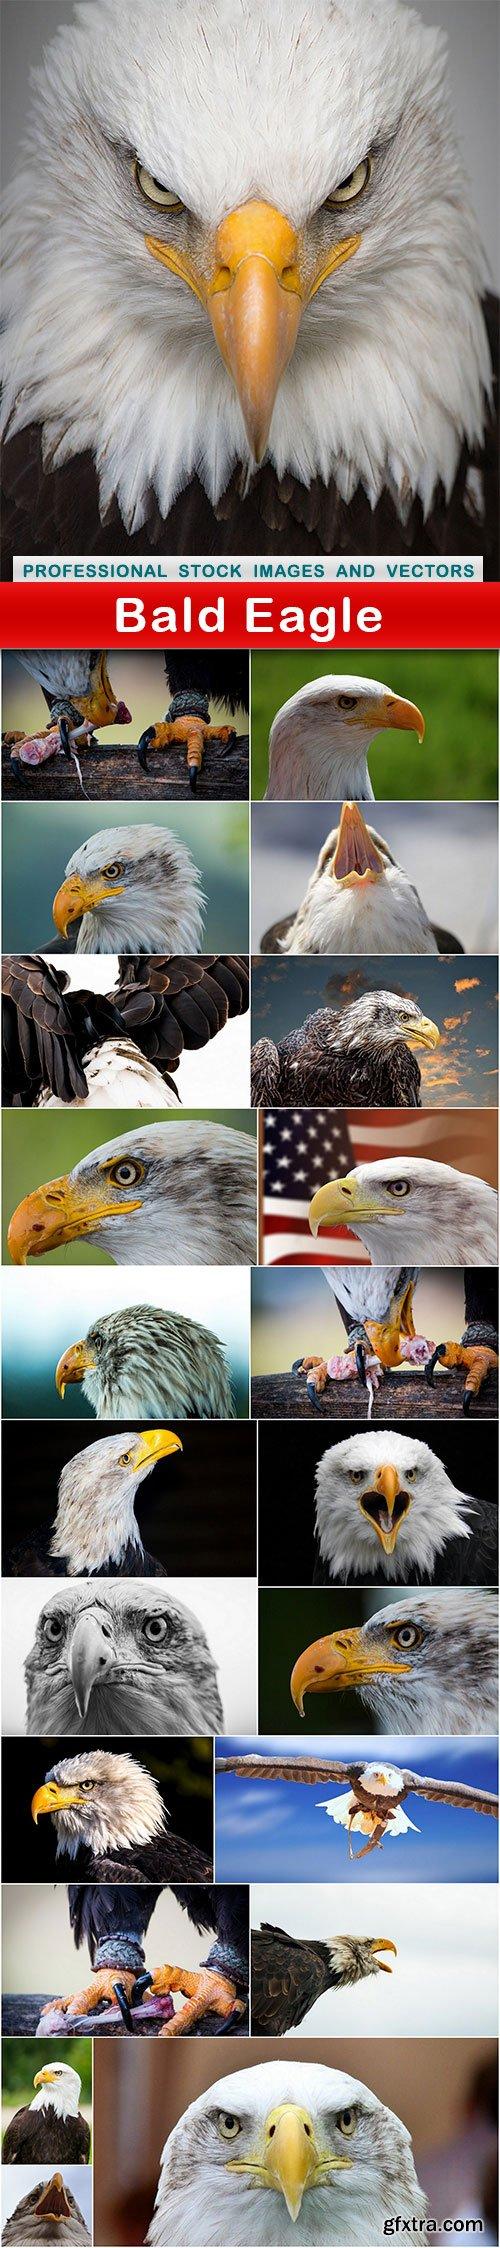 Bald Eagle - 22 UHQ JPEG